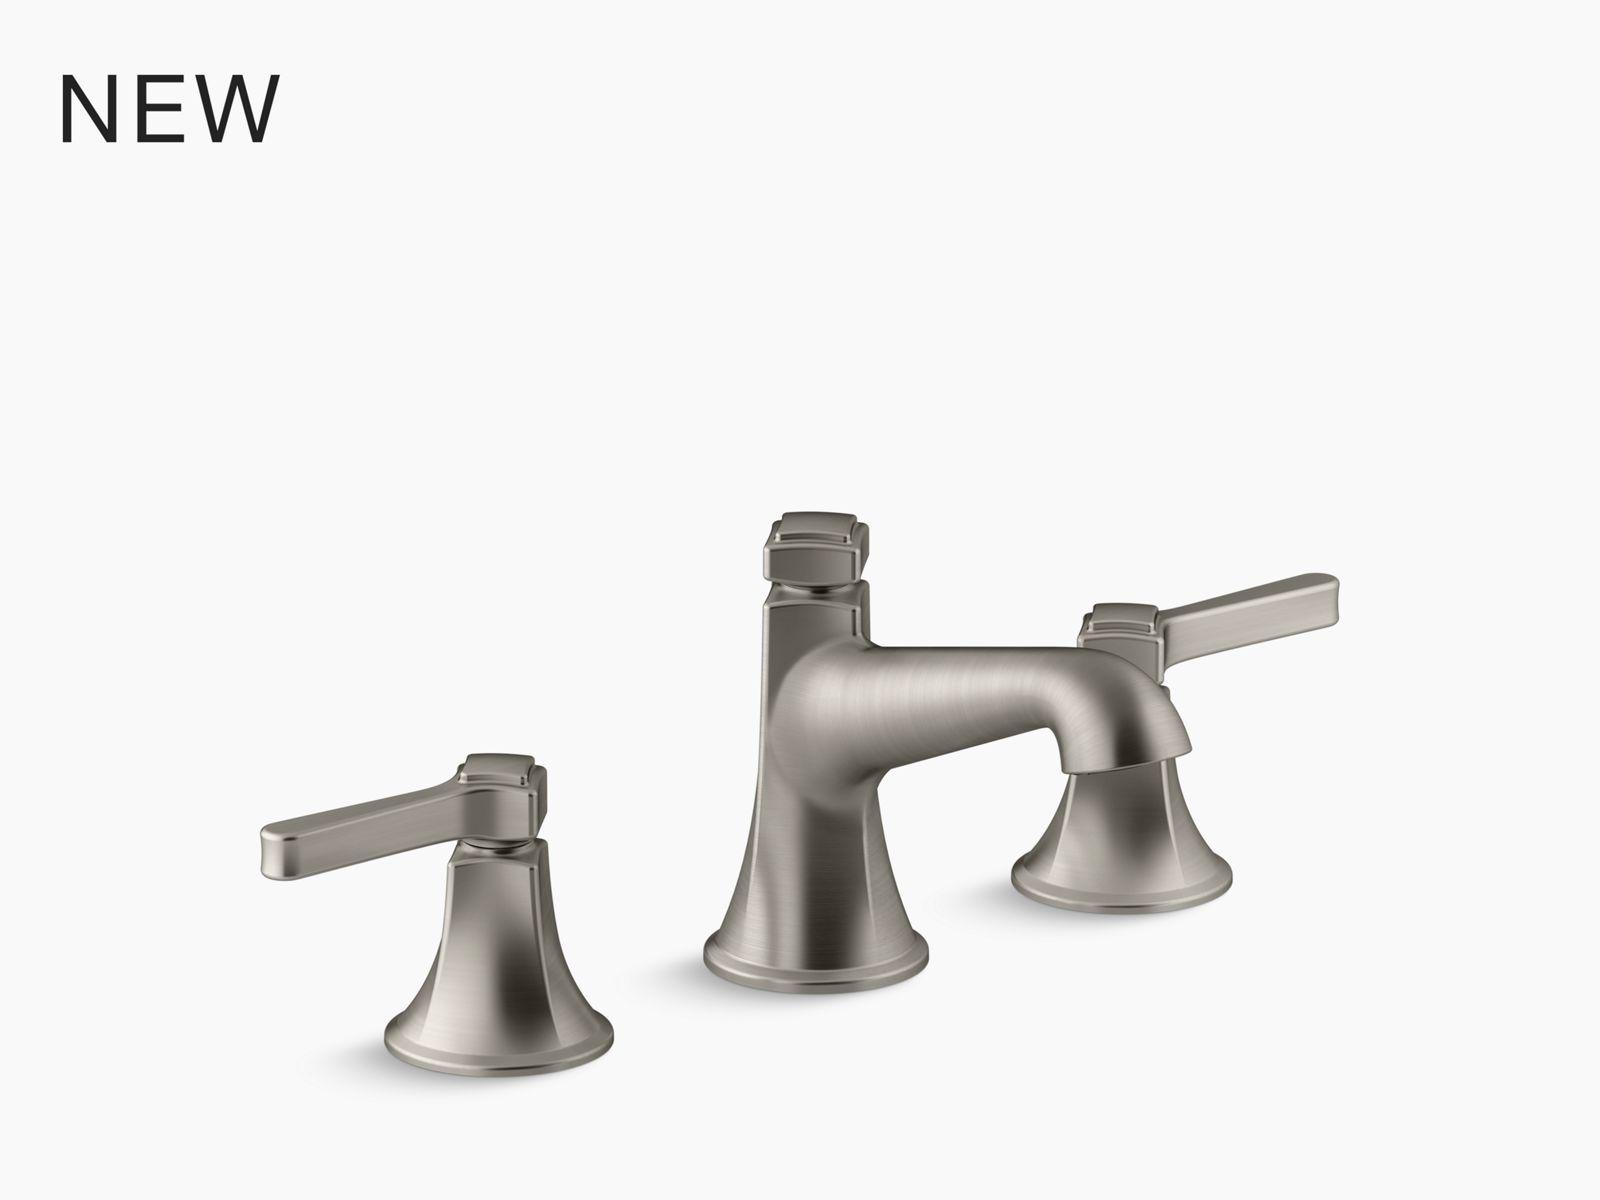 bancroft bath faucet trim for deck mount valve with diverter spout and metal lever handles valve not included